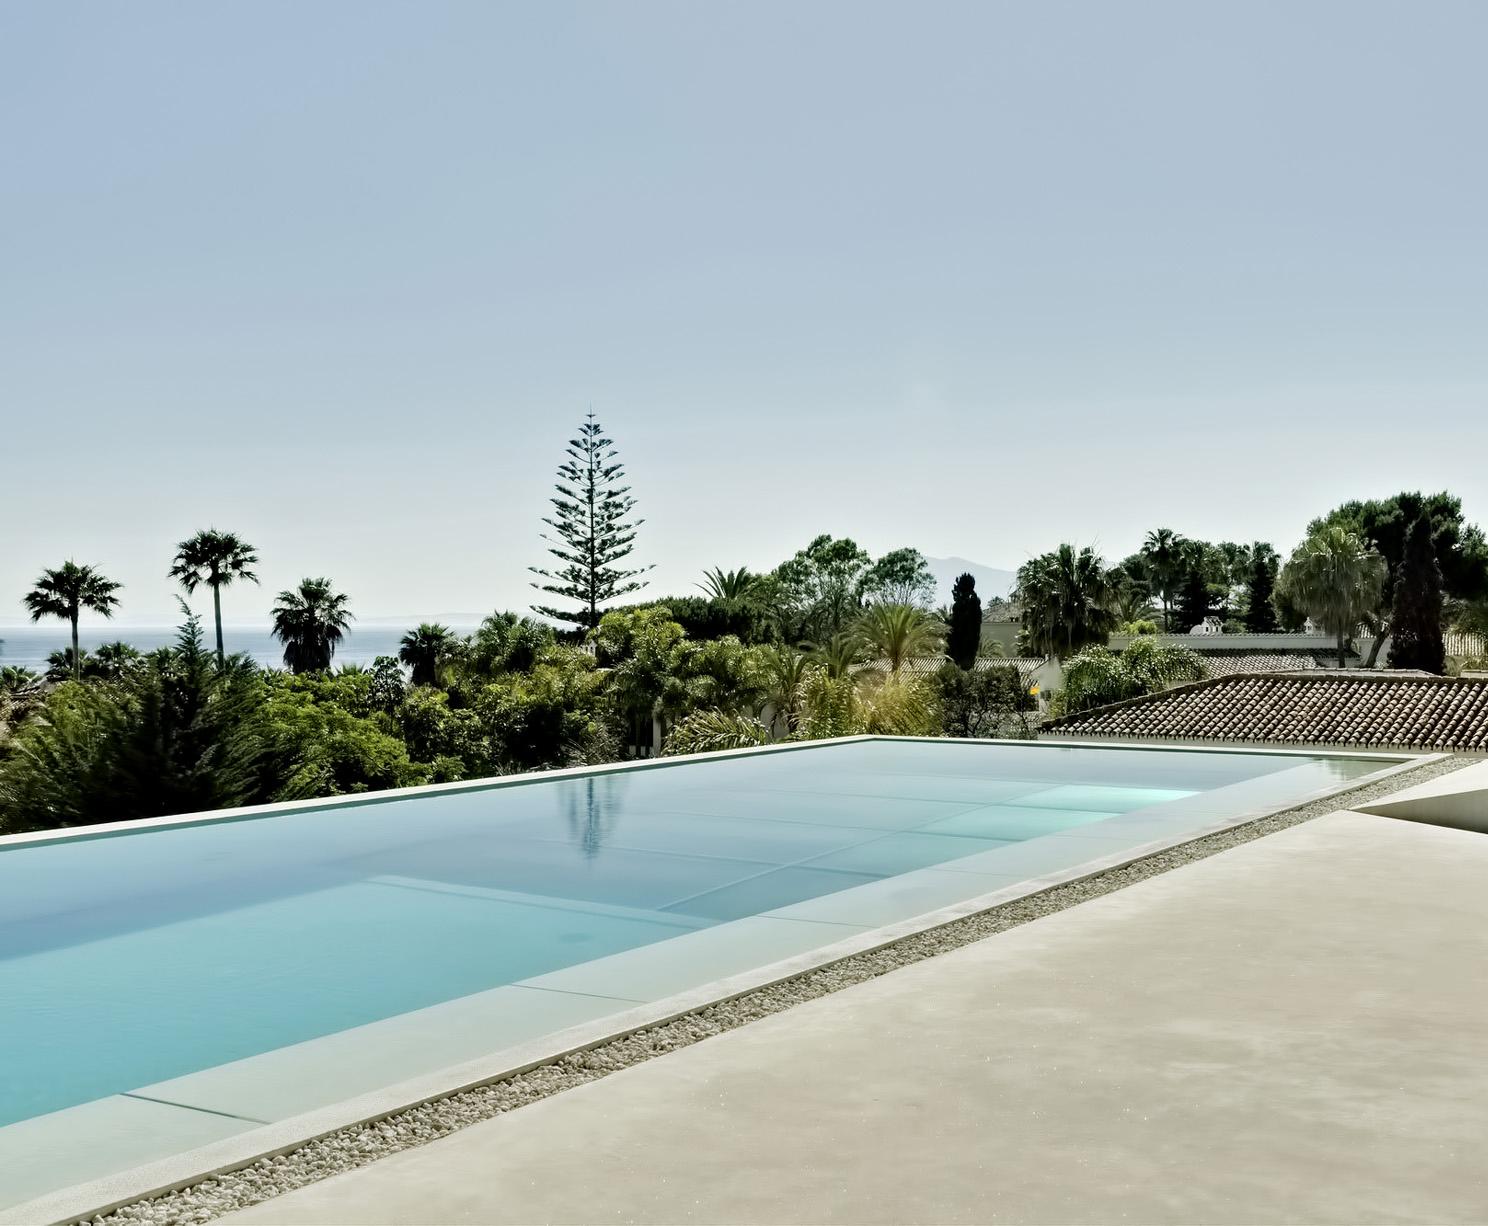 Los Monteros Luxury Residence – Marbella, Málaga, Spain